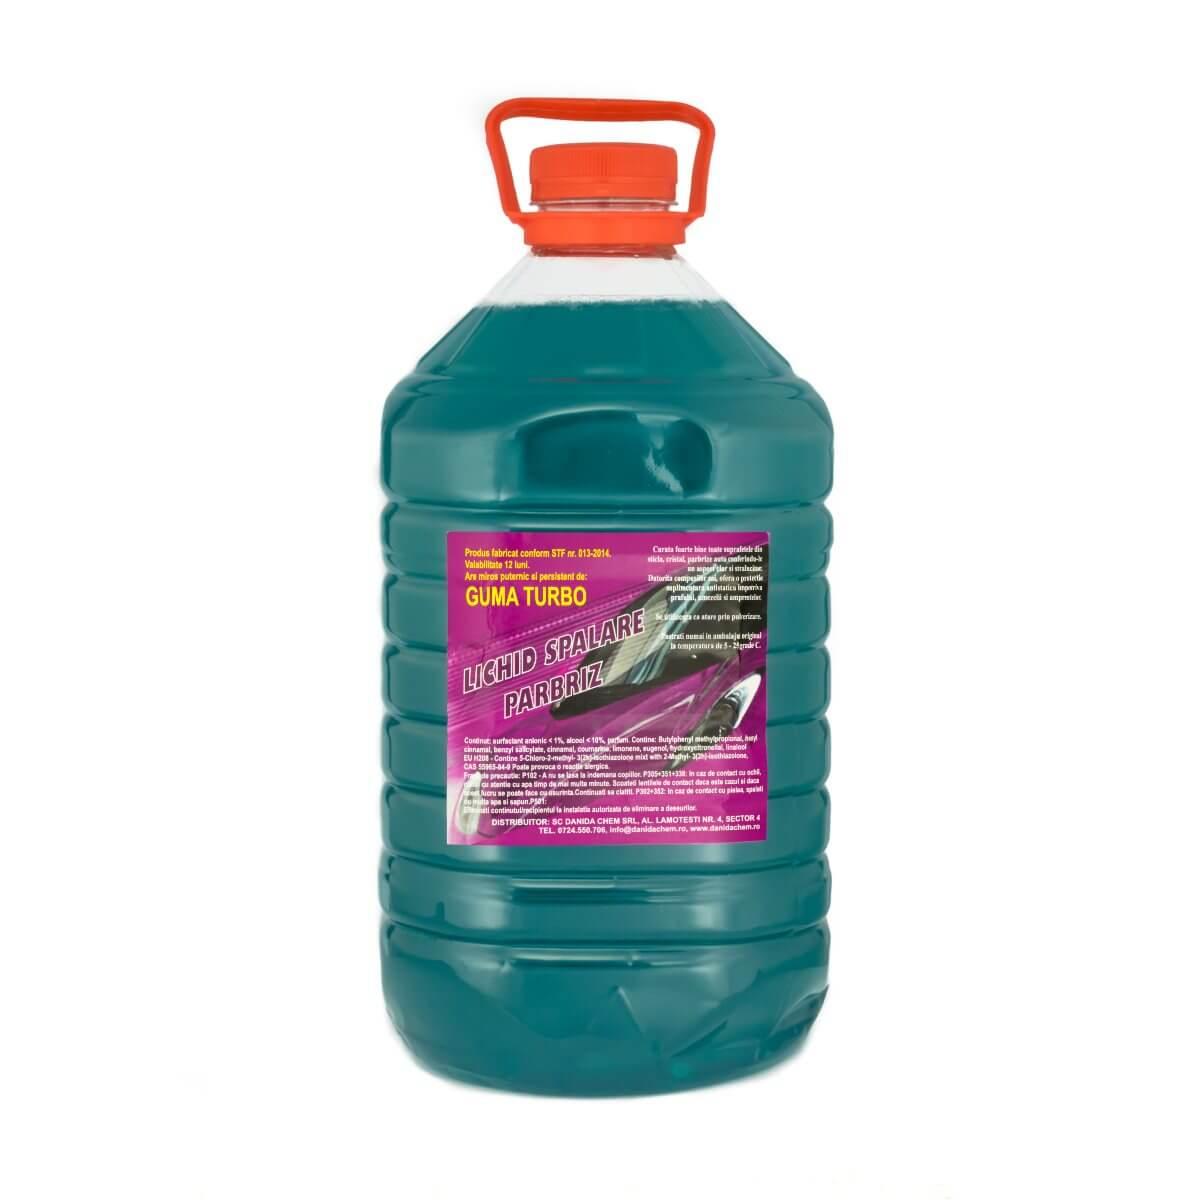 Lichid Parbriz Vara 5l Aroma Puternica De Guma Turbo Sau Liliac